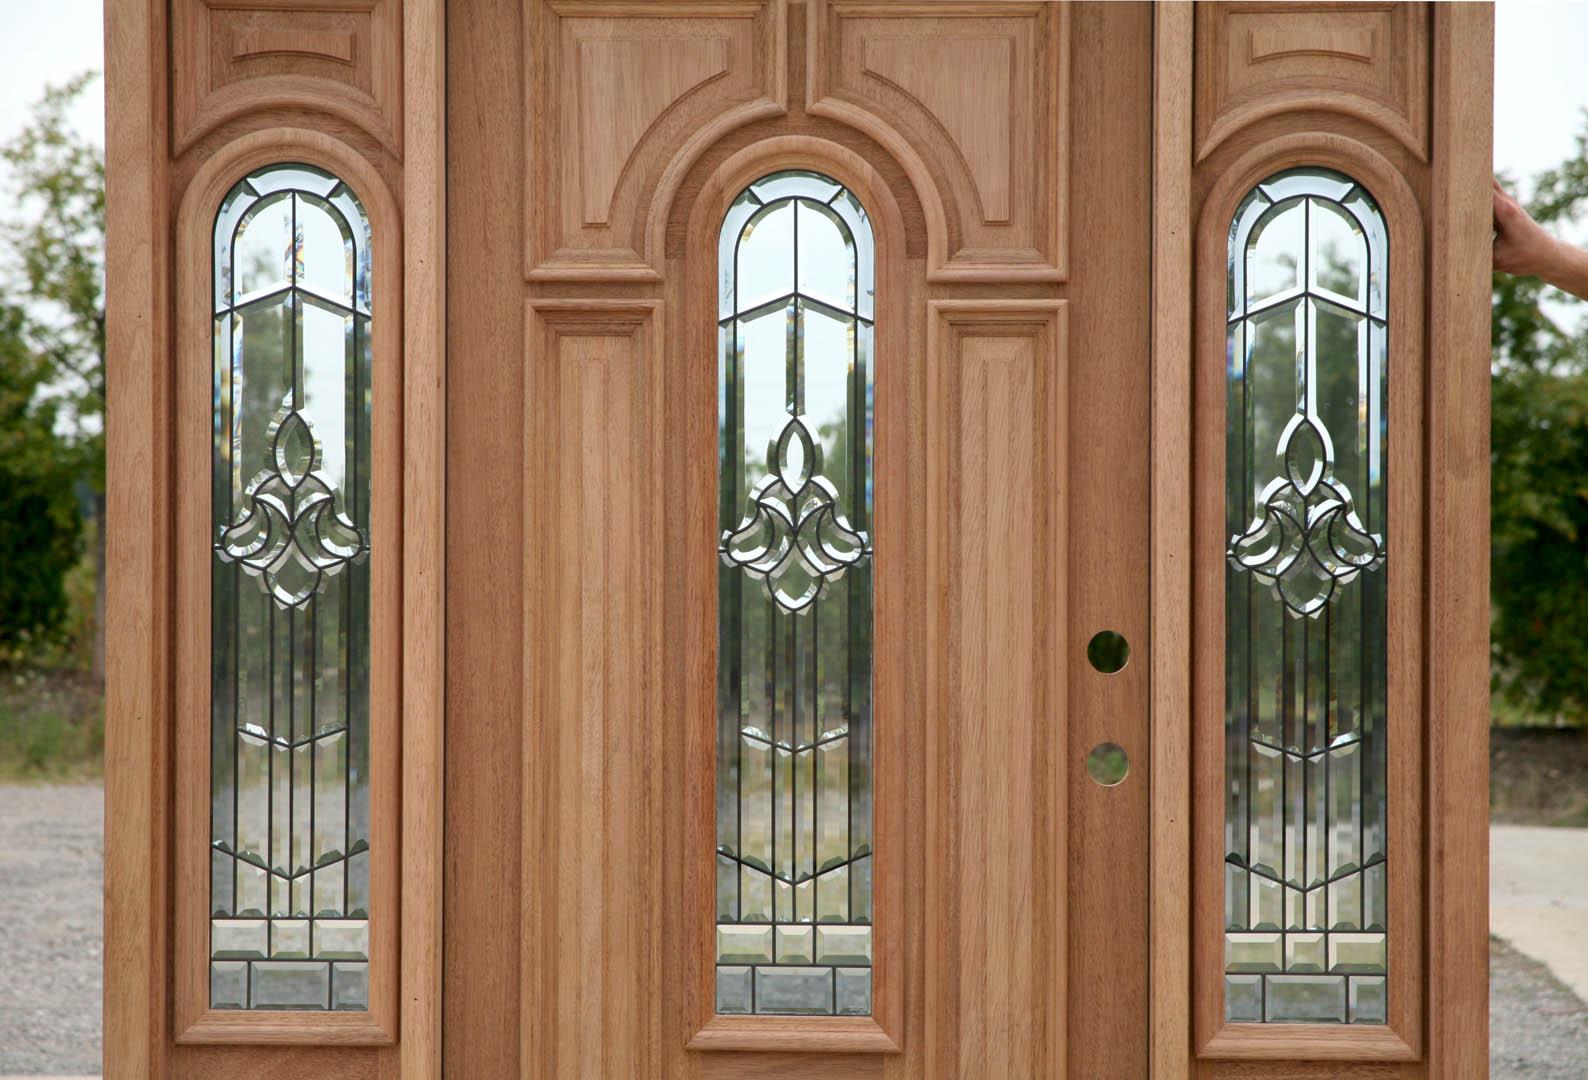 1080 #71492E Quickship Exterior Doors Most Popular Door save image Exterior Doors Clearance 38571588